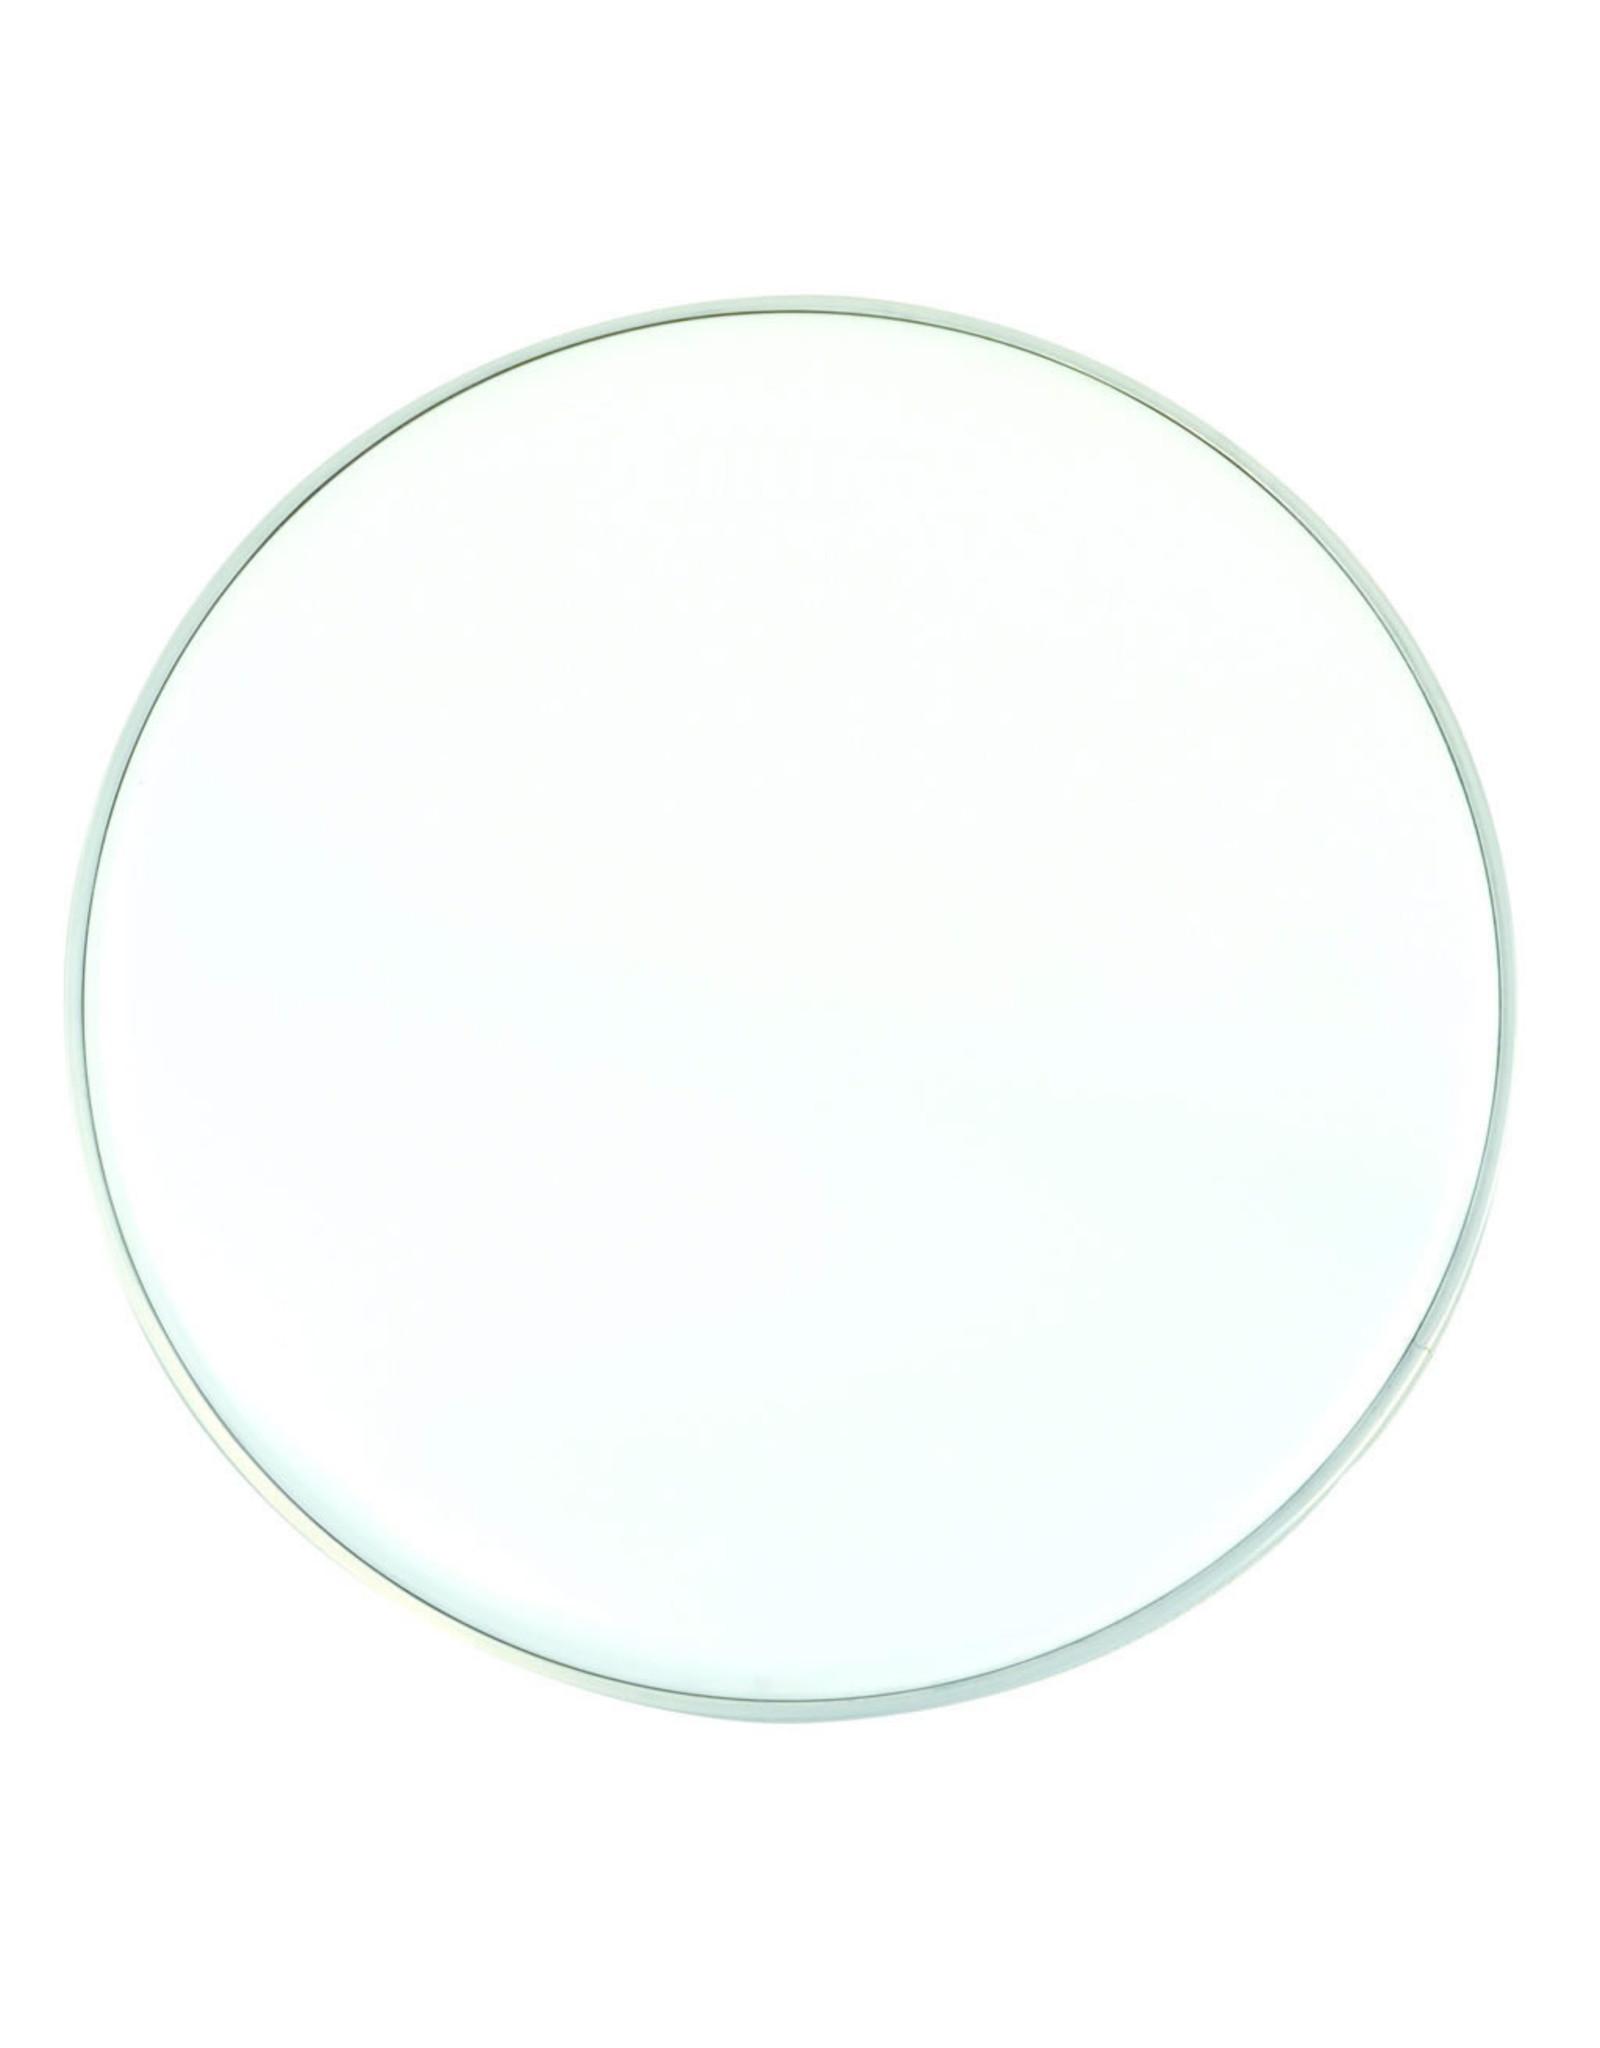 Ramm®  Drumhead 16 Inch | Transparent Resonance